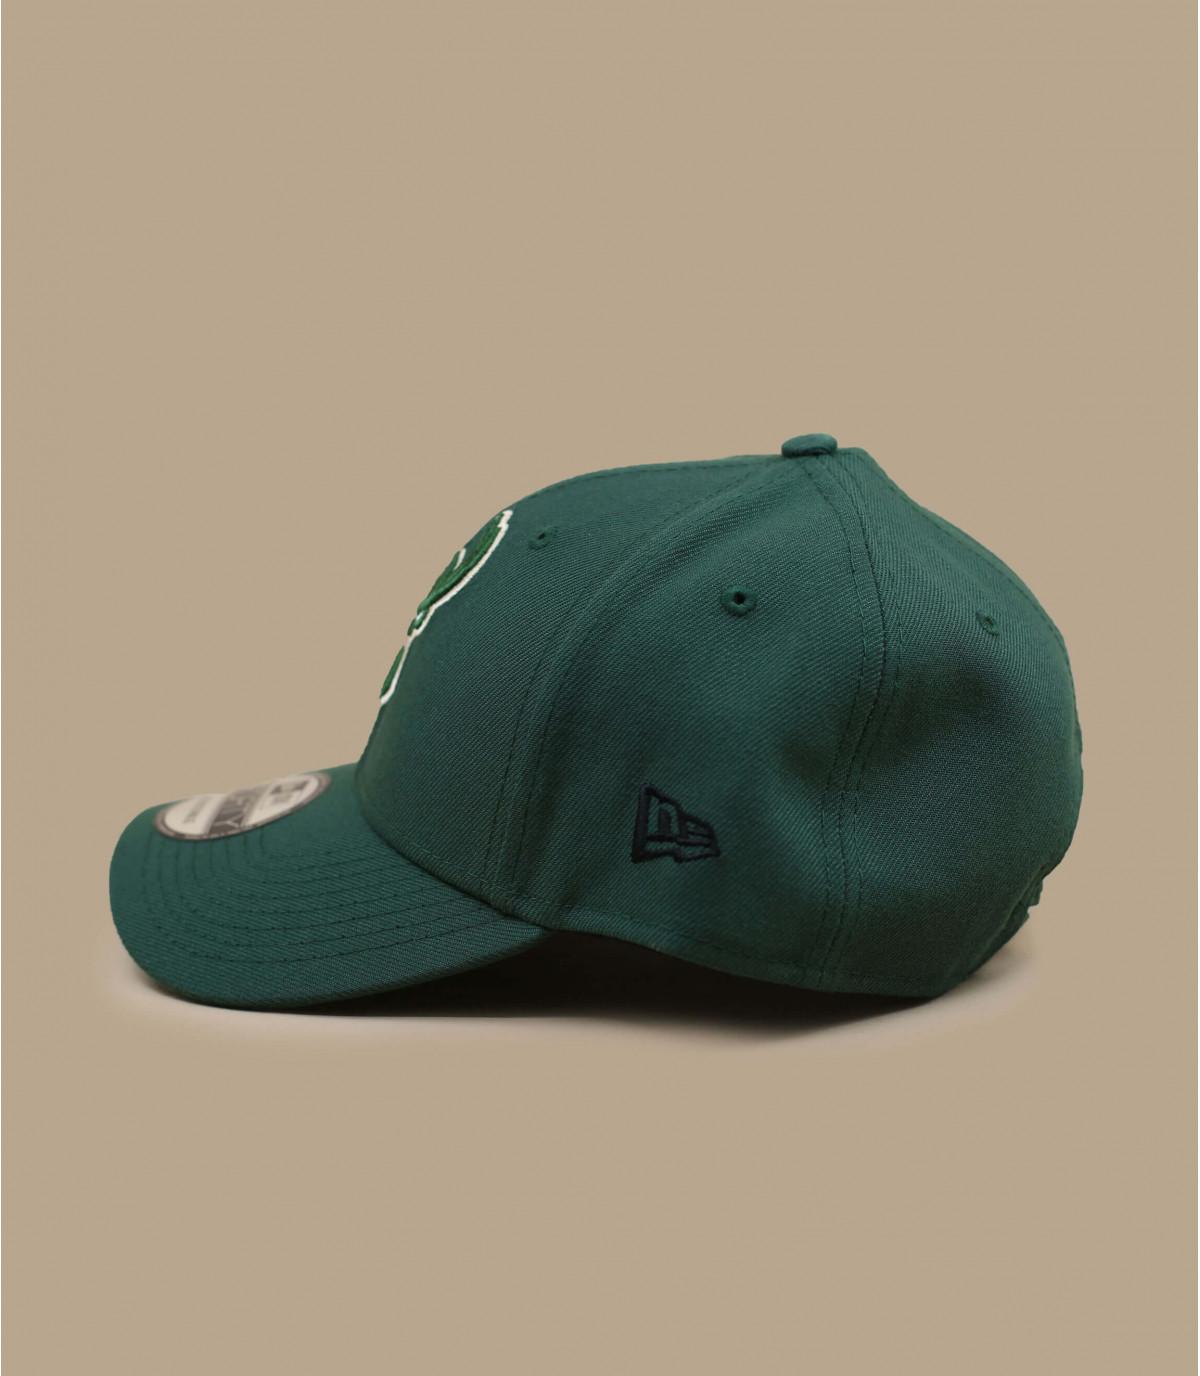 Bucks de la curva gorra verde